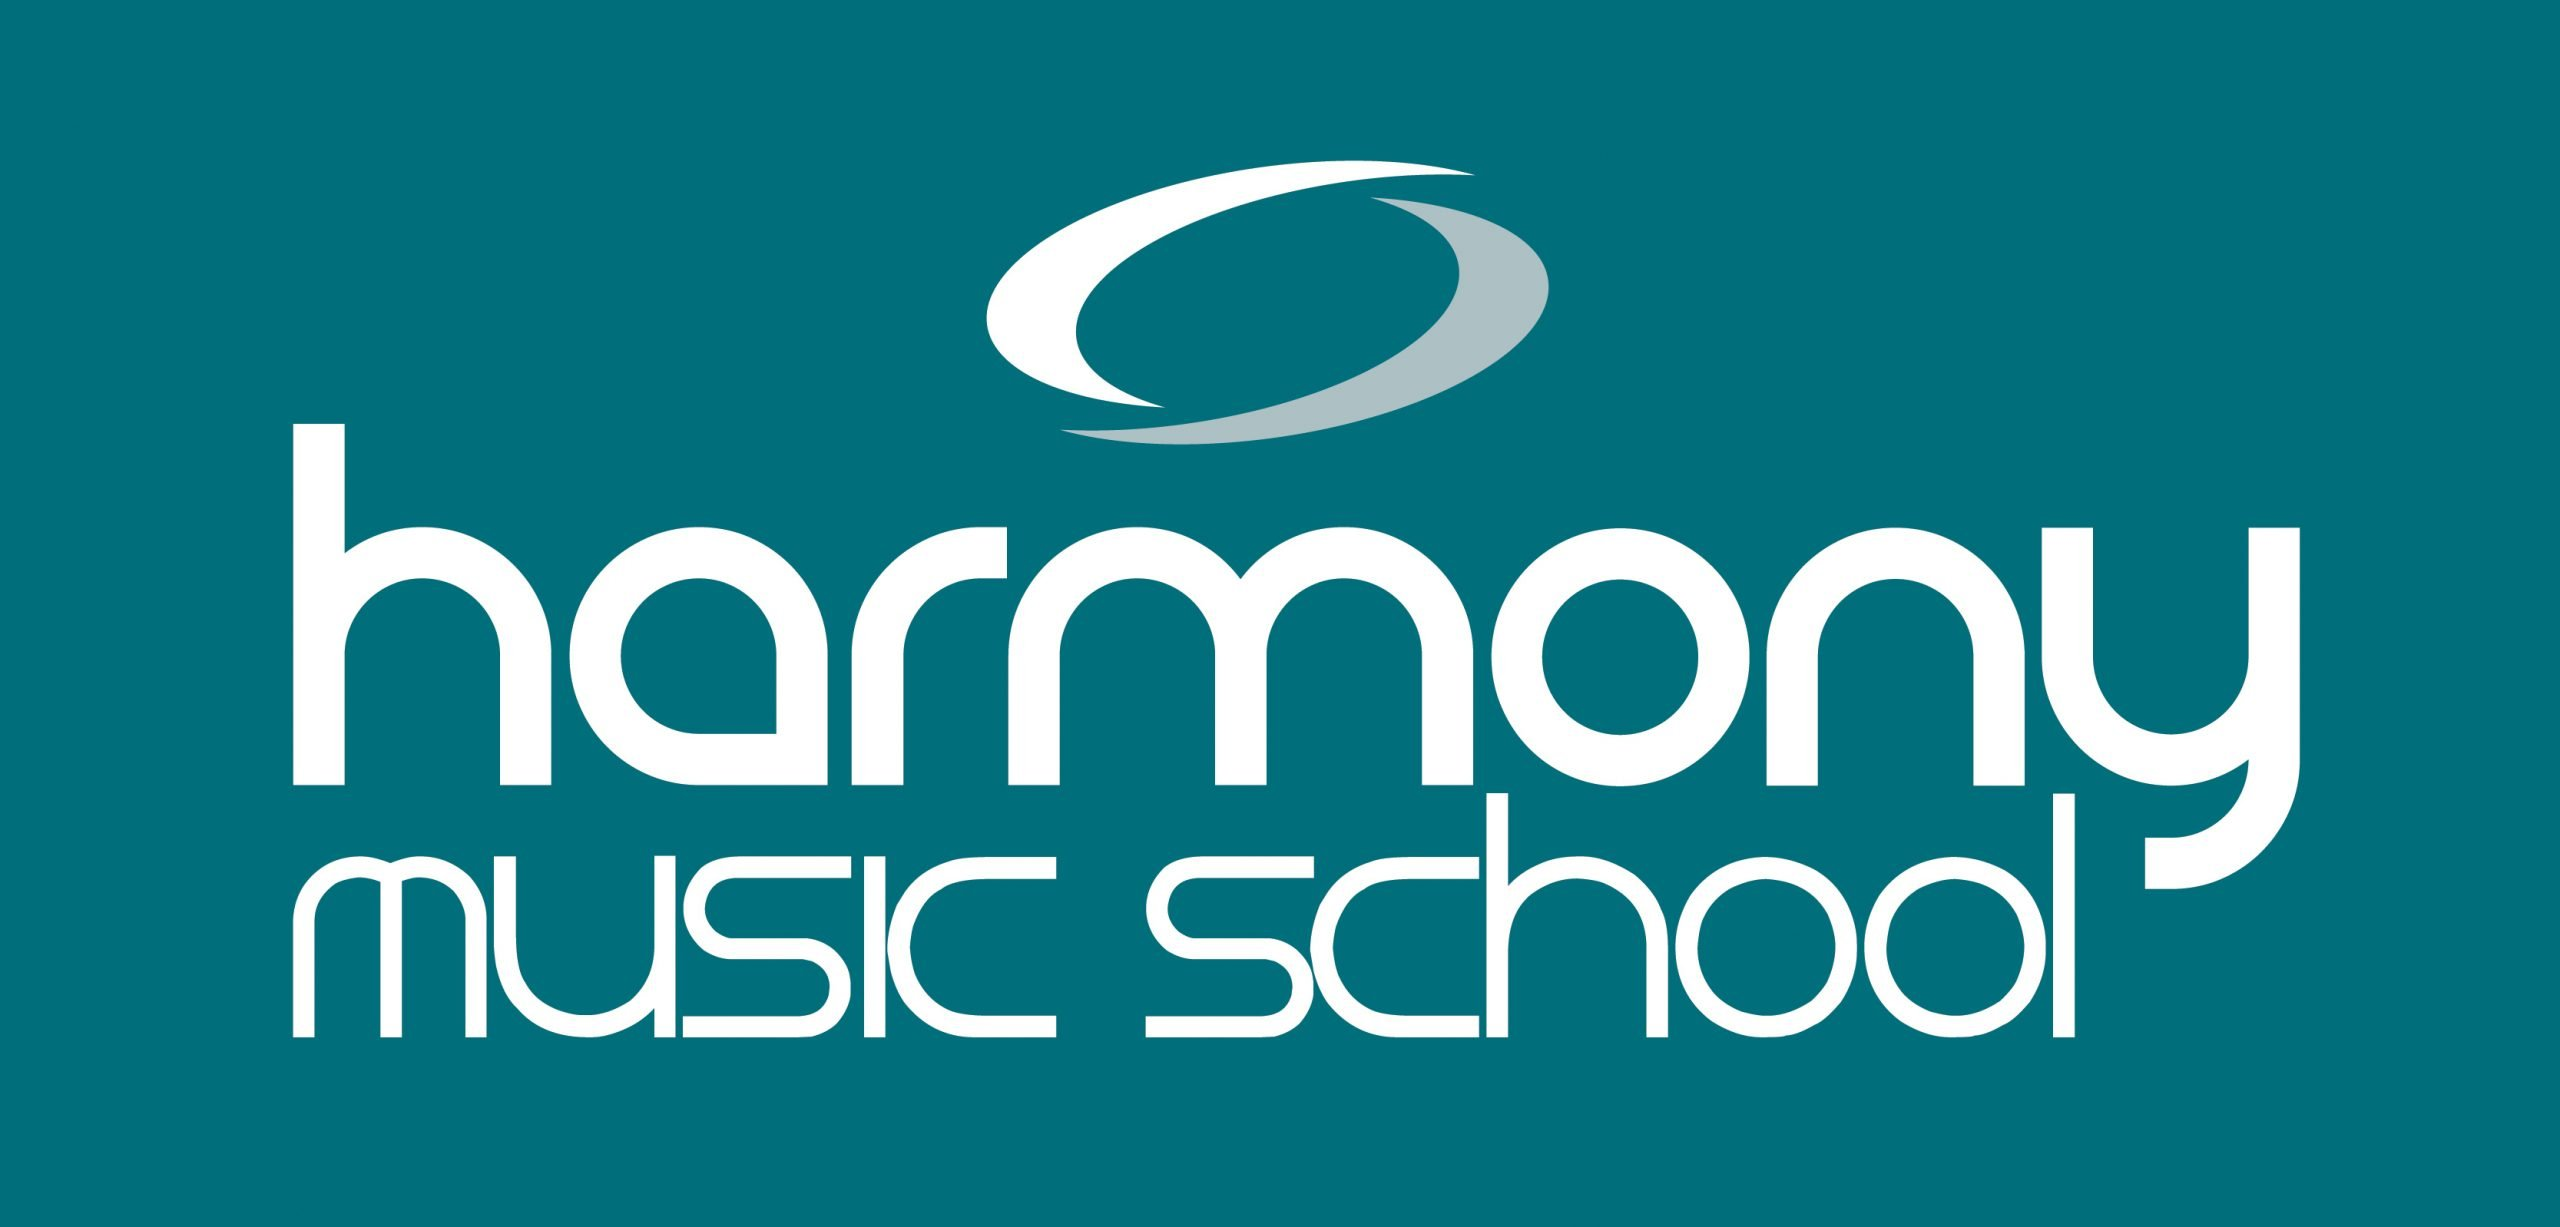 NEW harmony music school WEB LOGO